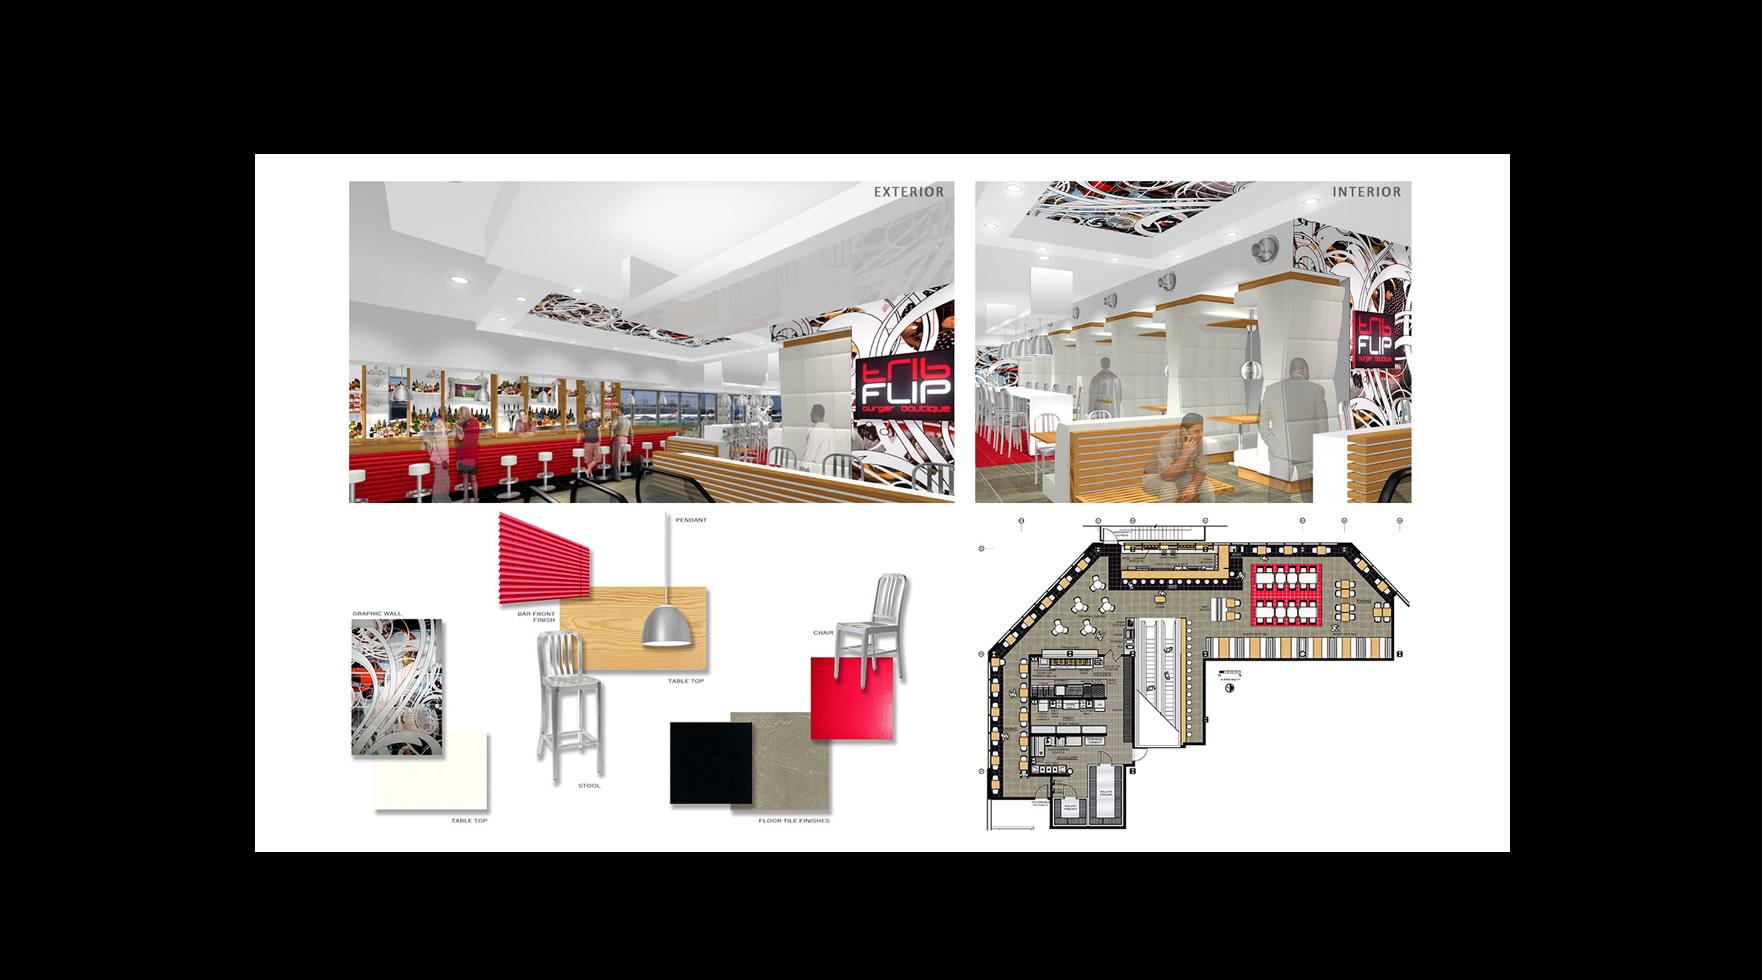 Norris Design Studio Requests for Proposal RFP